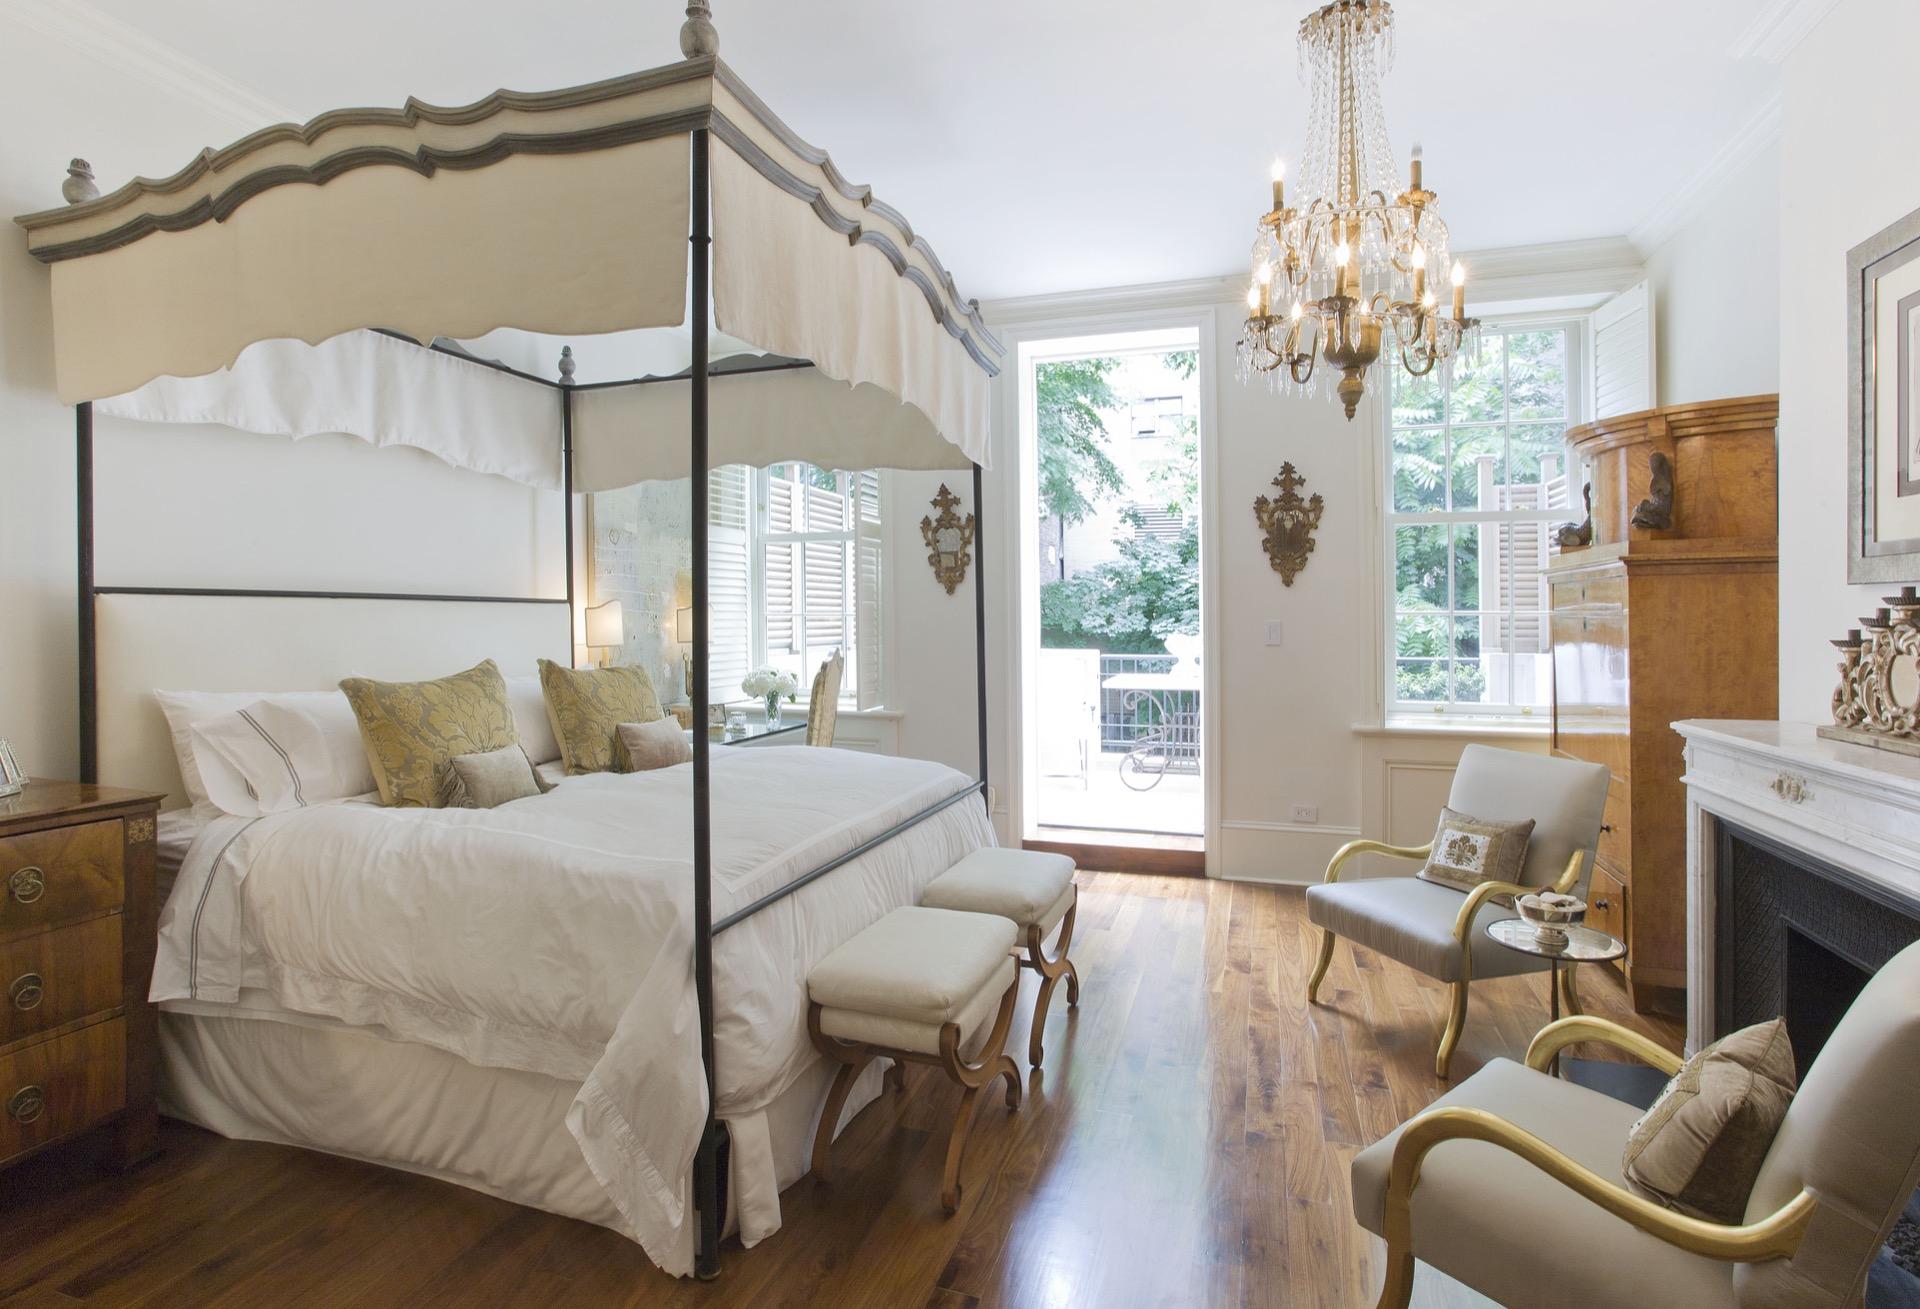 Tara shaw interior design bedroom new york brown stone for Tara louise interior decoration design